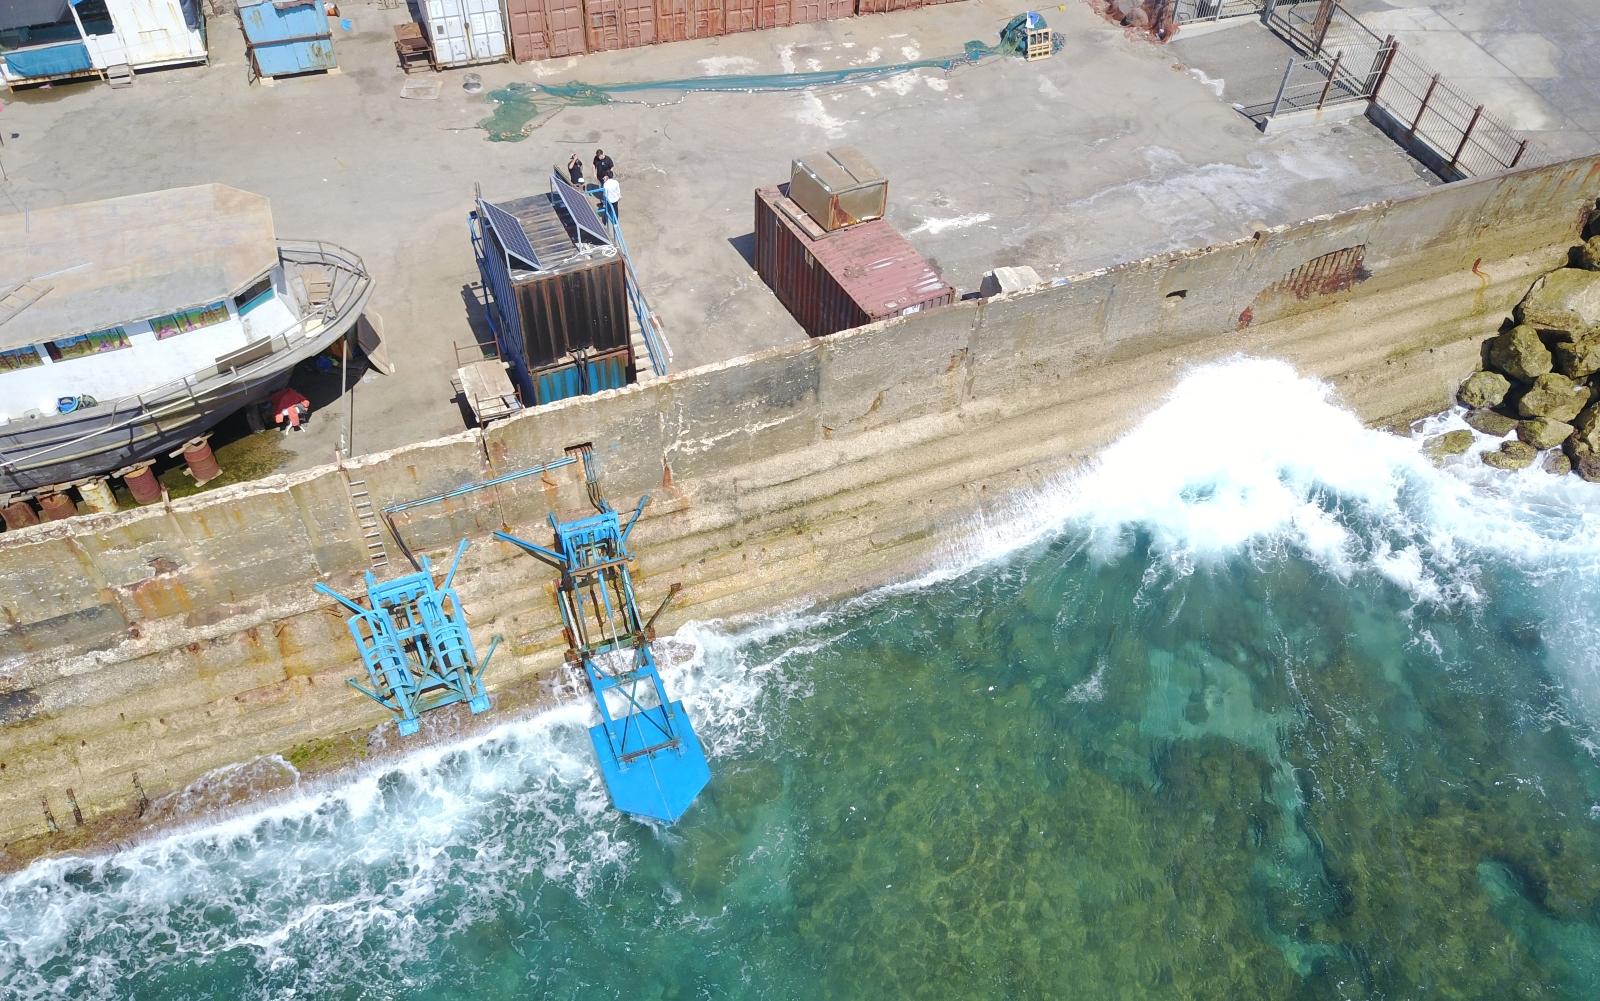 Eco Wave Power's demo site at Jaffa Port. Photo courtesy